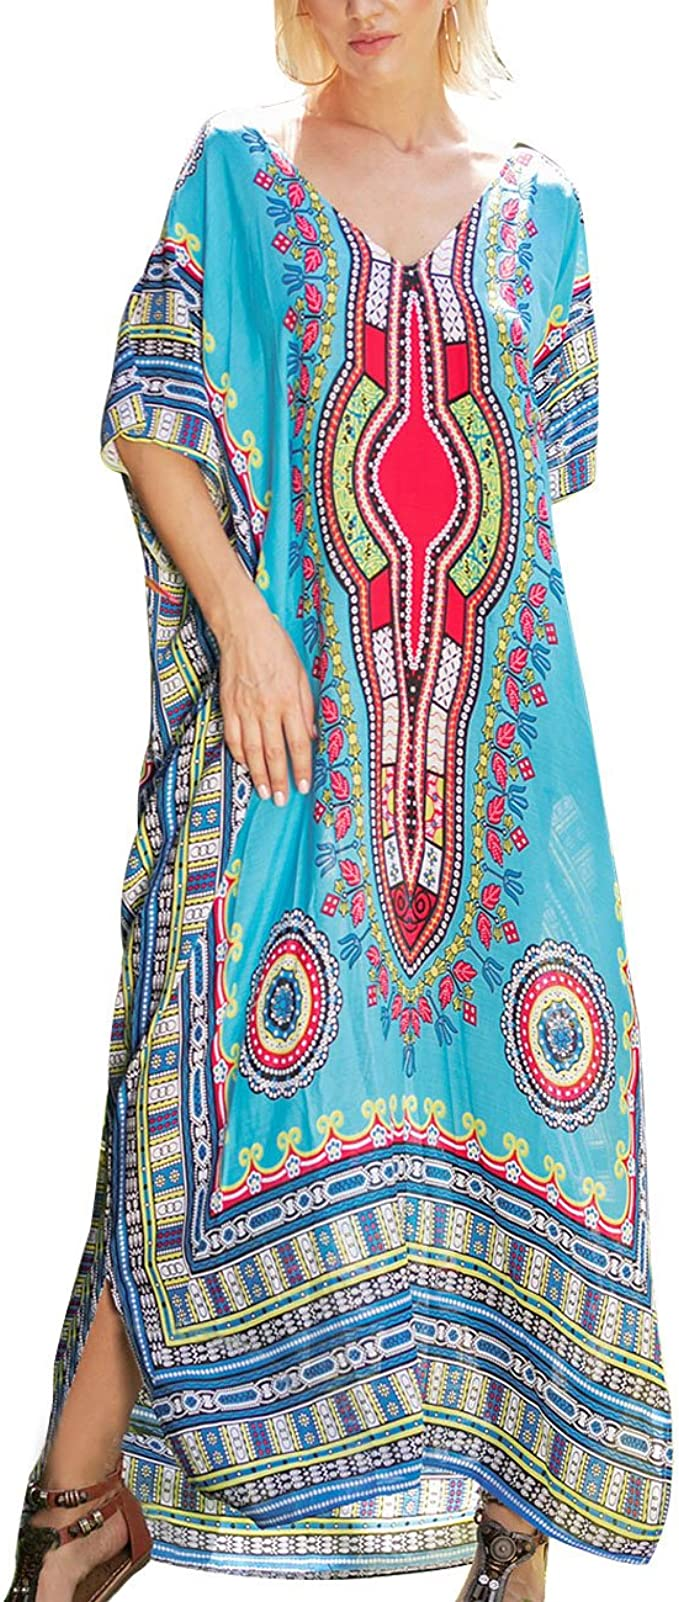 Blue Floral KaftanCaftan Dress Delivery Dress Maxi Dress Resort Coverup Summer Dress Gift for Her Night Wear Wedding plus dress